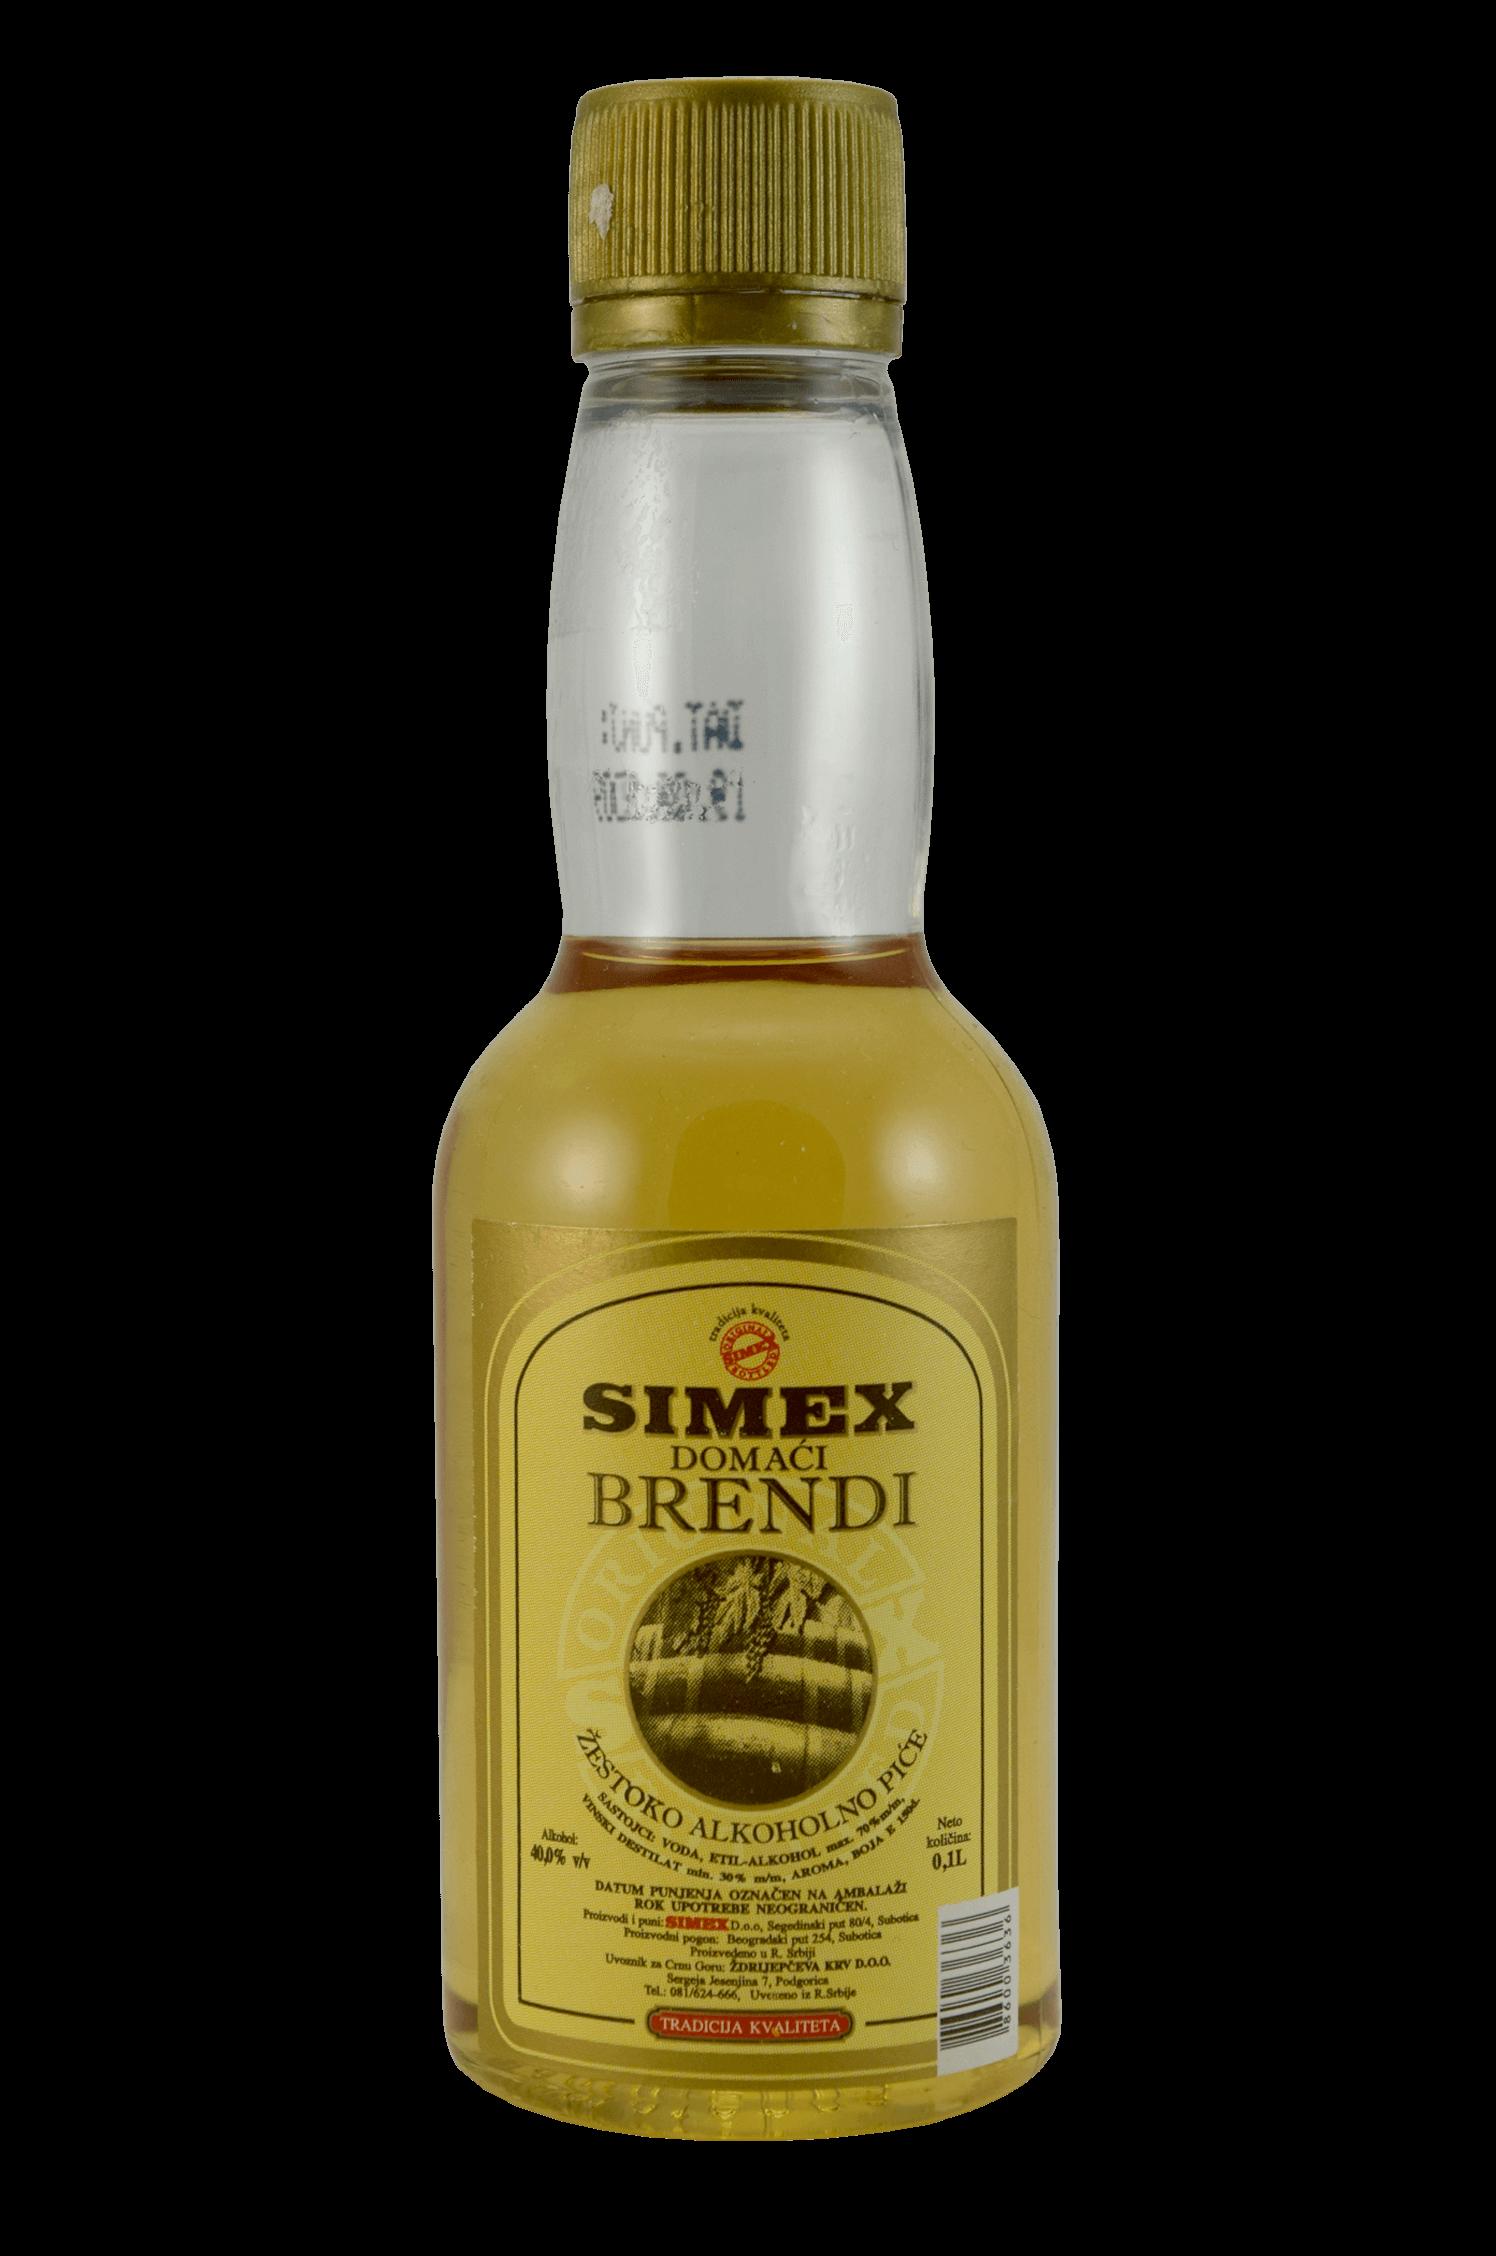 Simex Domači Brendi